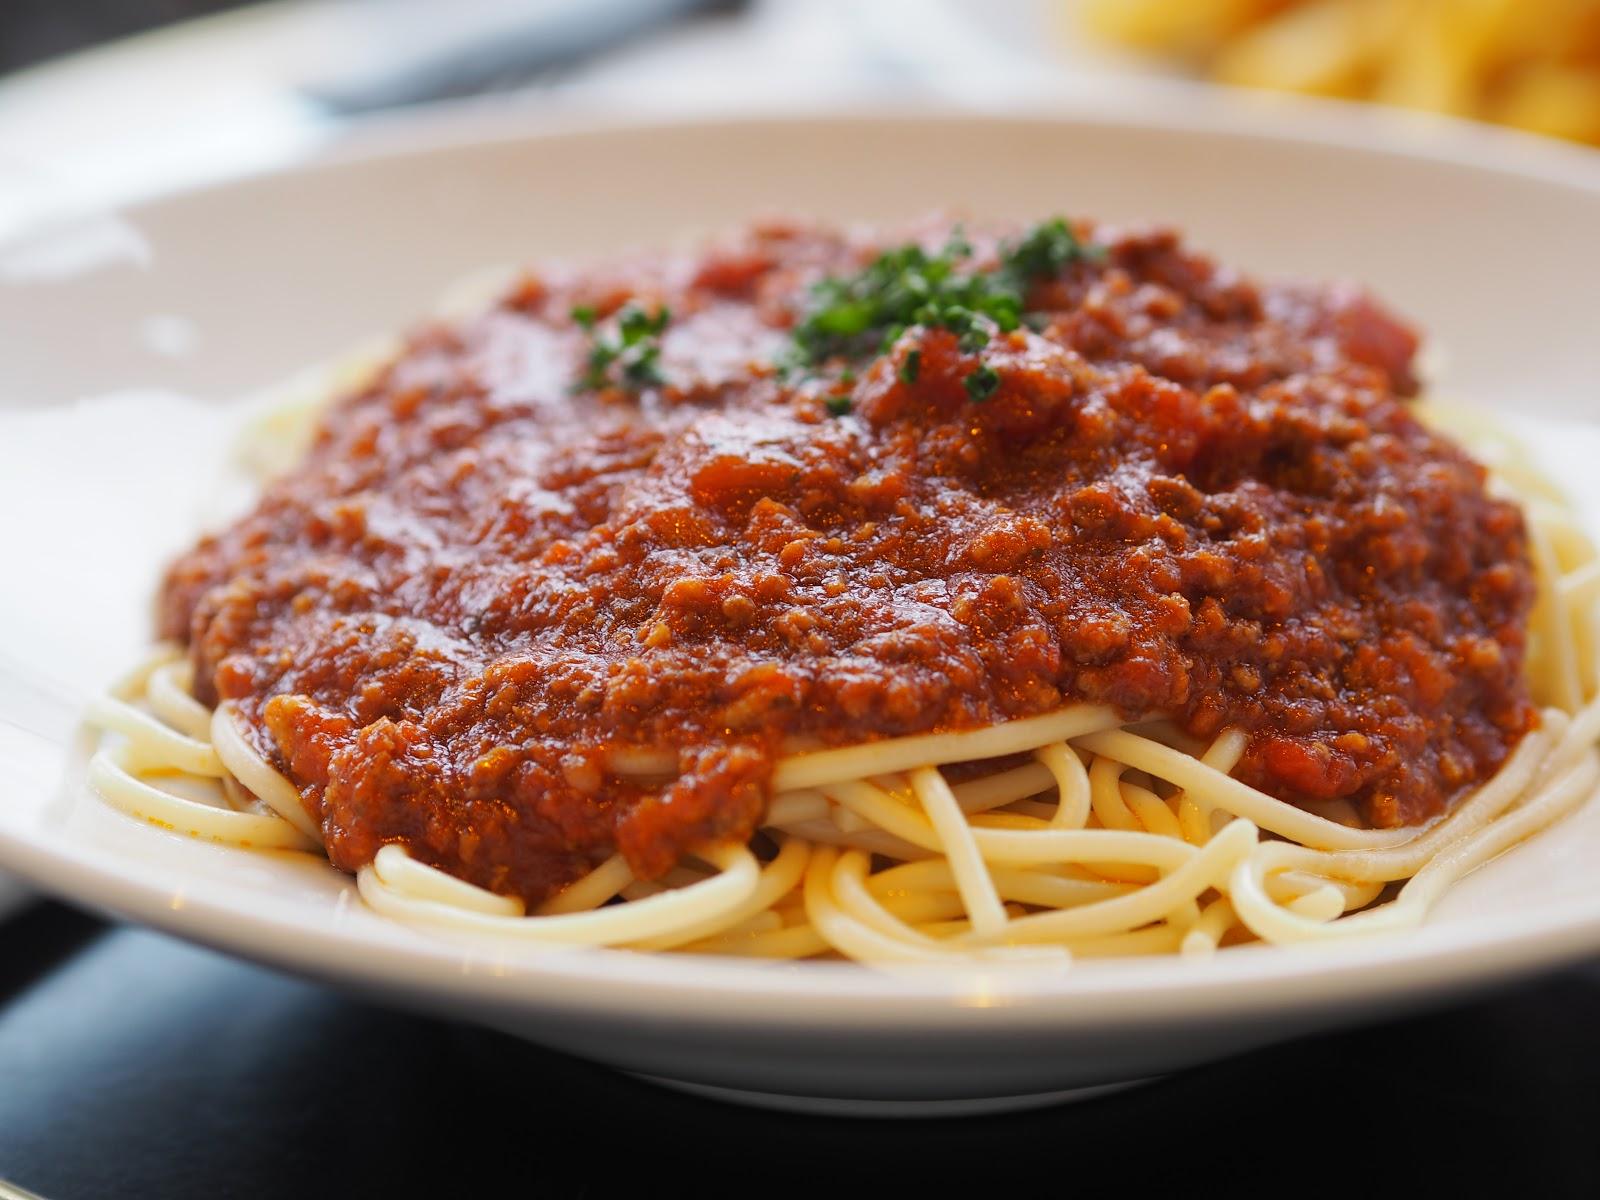 Plate of Spaghetti Bolognaise